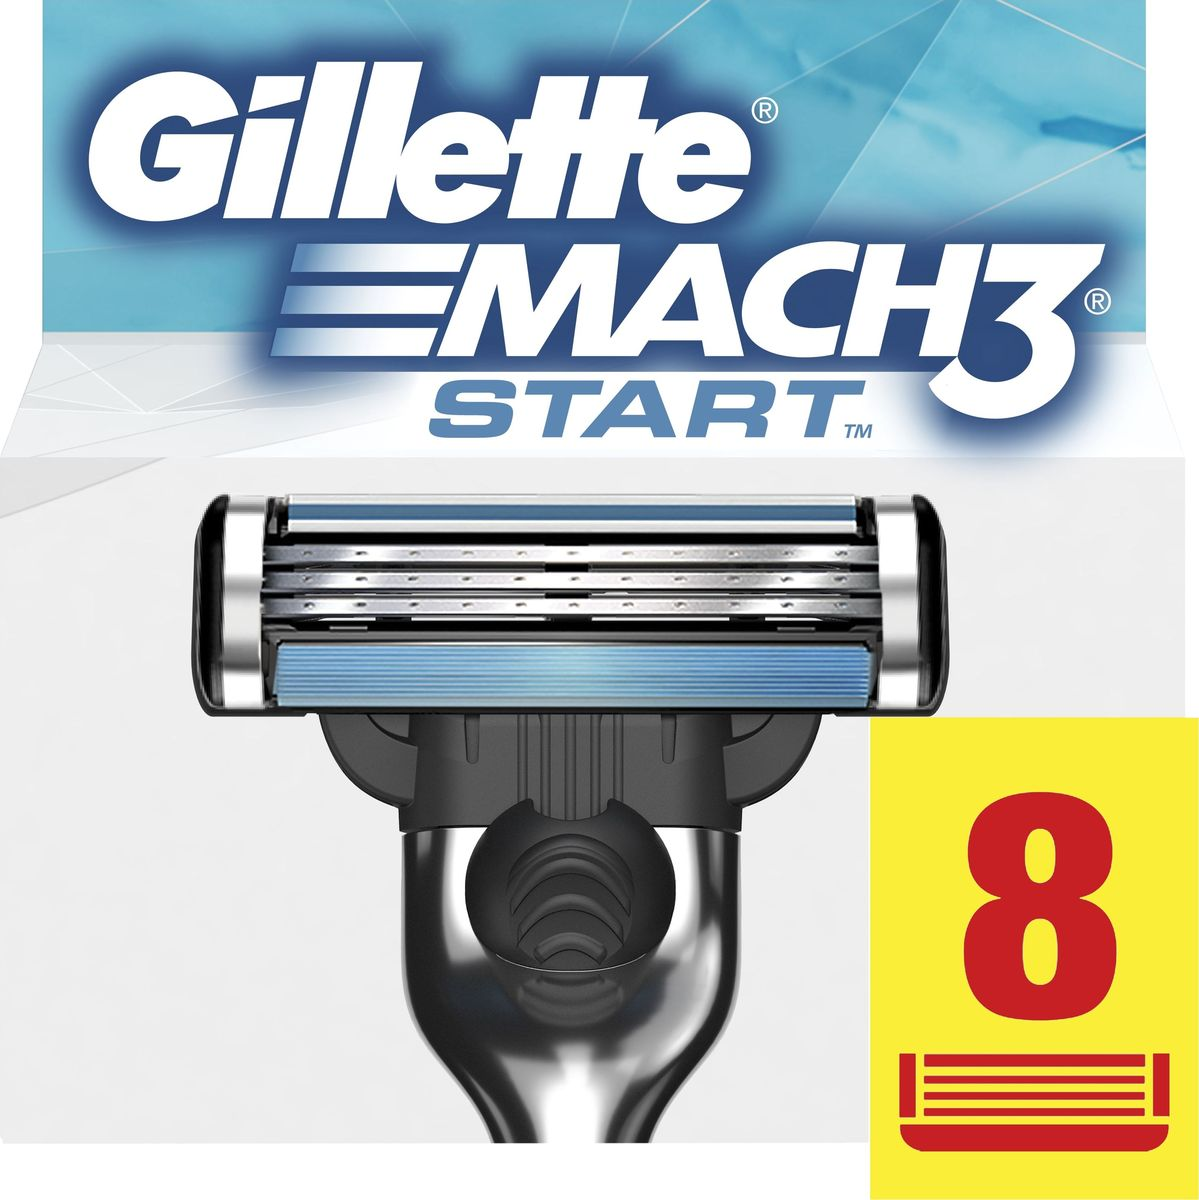 Gillette Mach 3 Start Сменные кассеты для бритвы, 8 шт cменные кассеты для бритья mach 3 gillette 4 шт